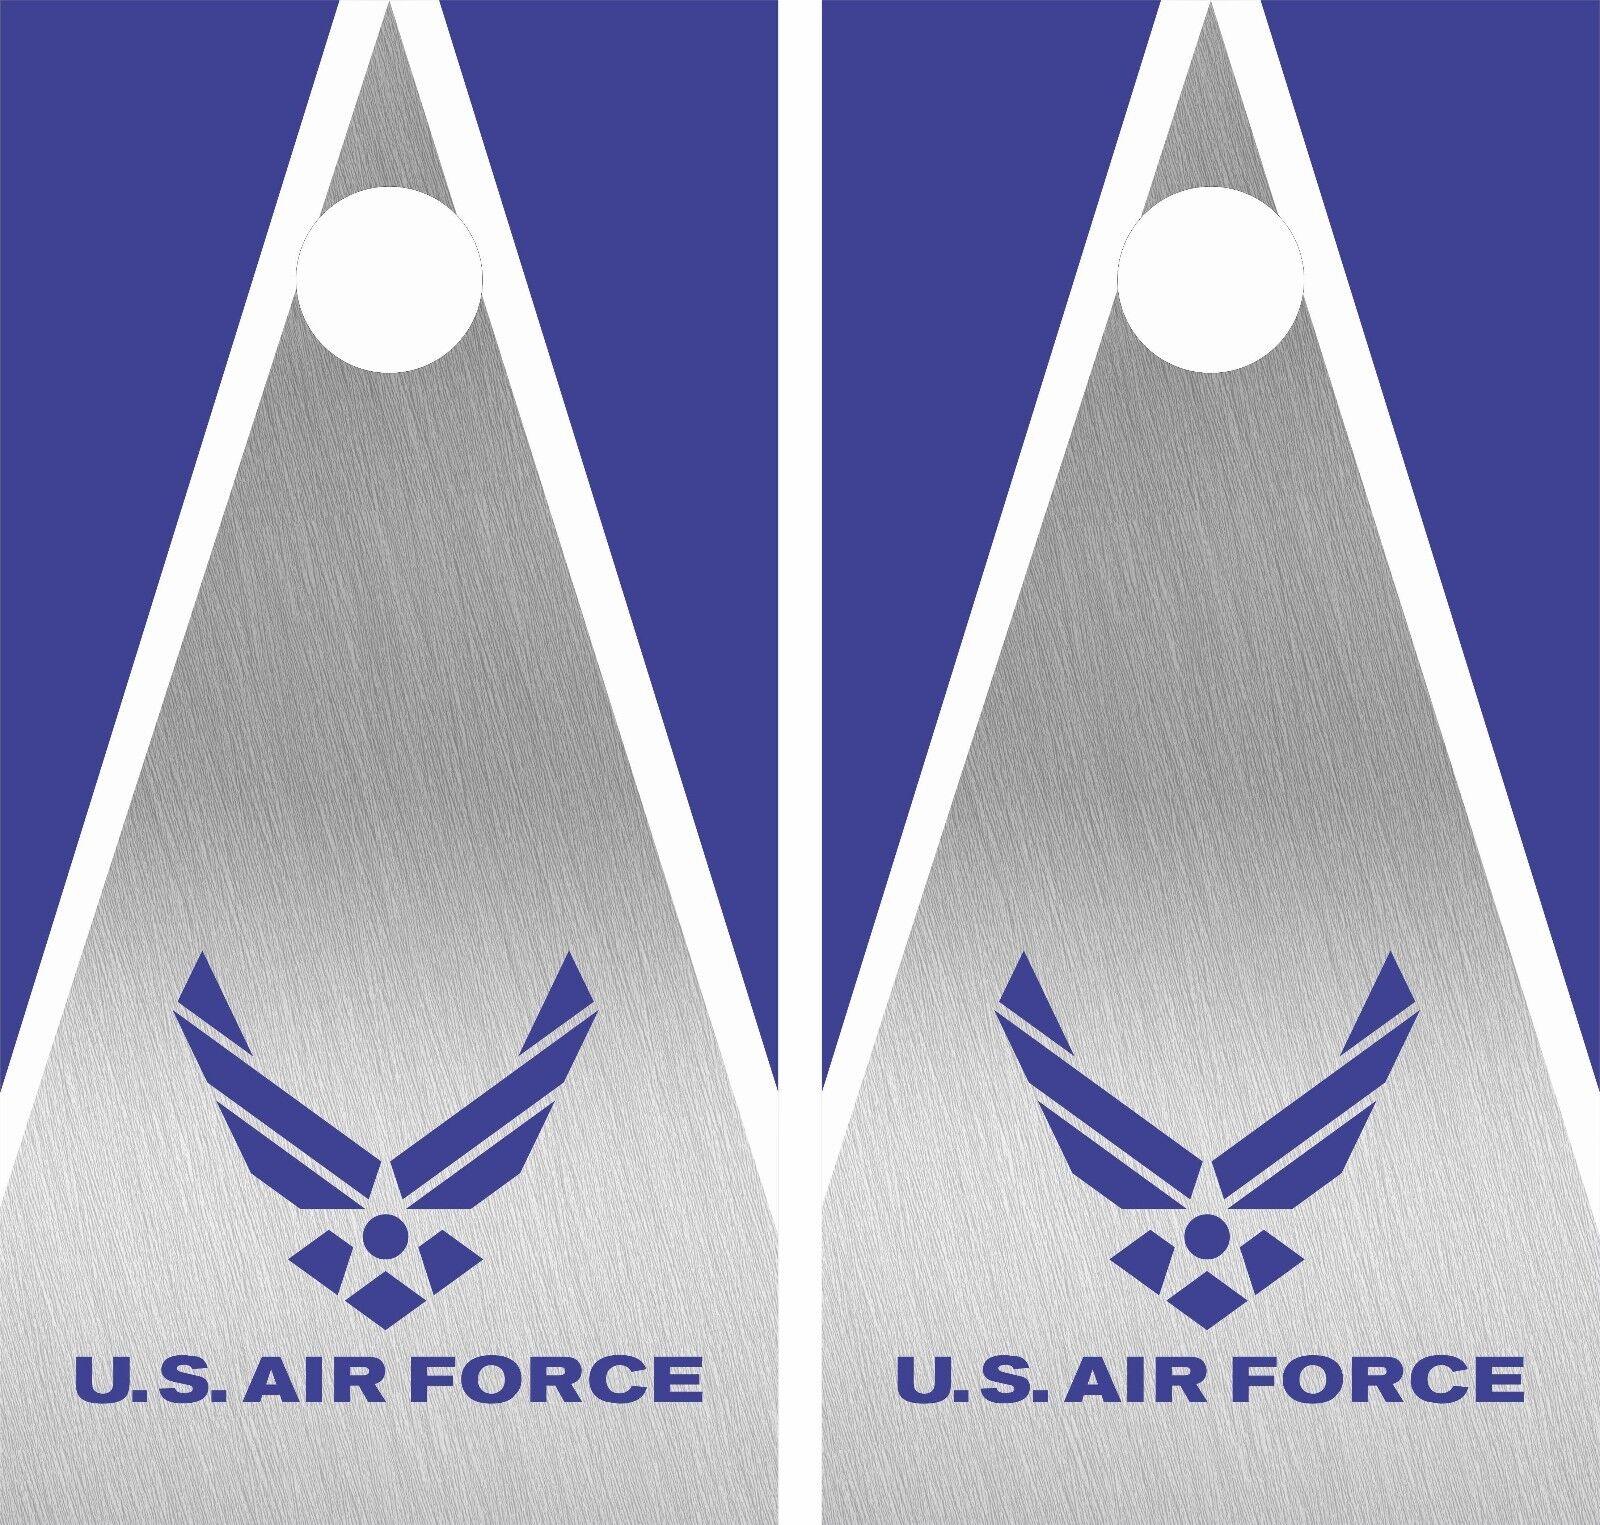 US AIR FORCE .Cornhole Board Game Decal Wraps USA High Quality Image bag 3M